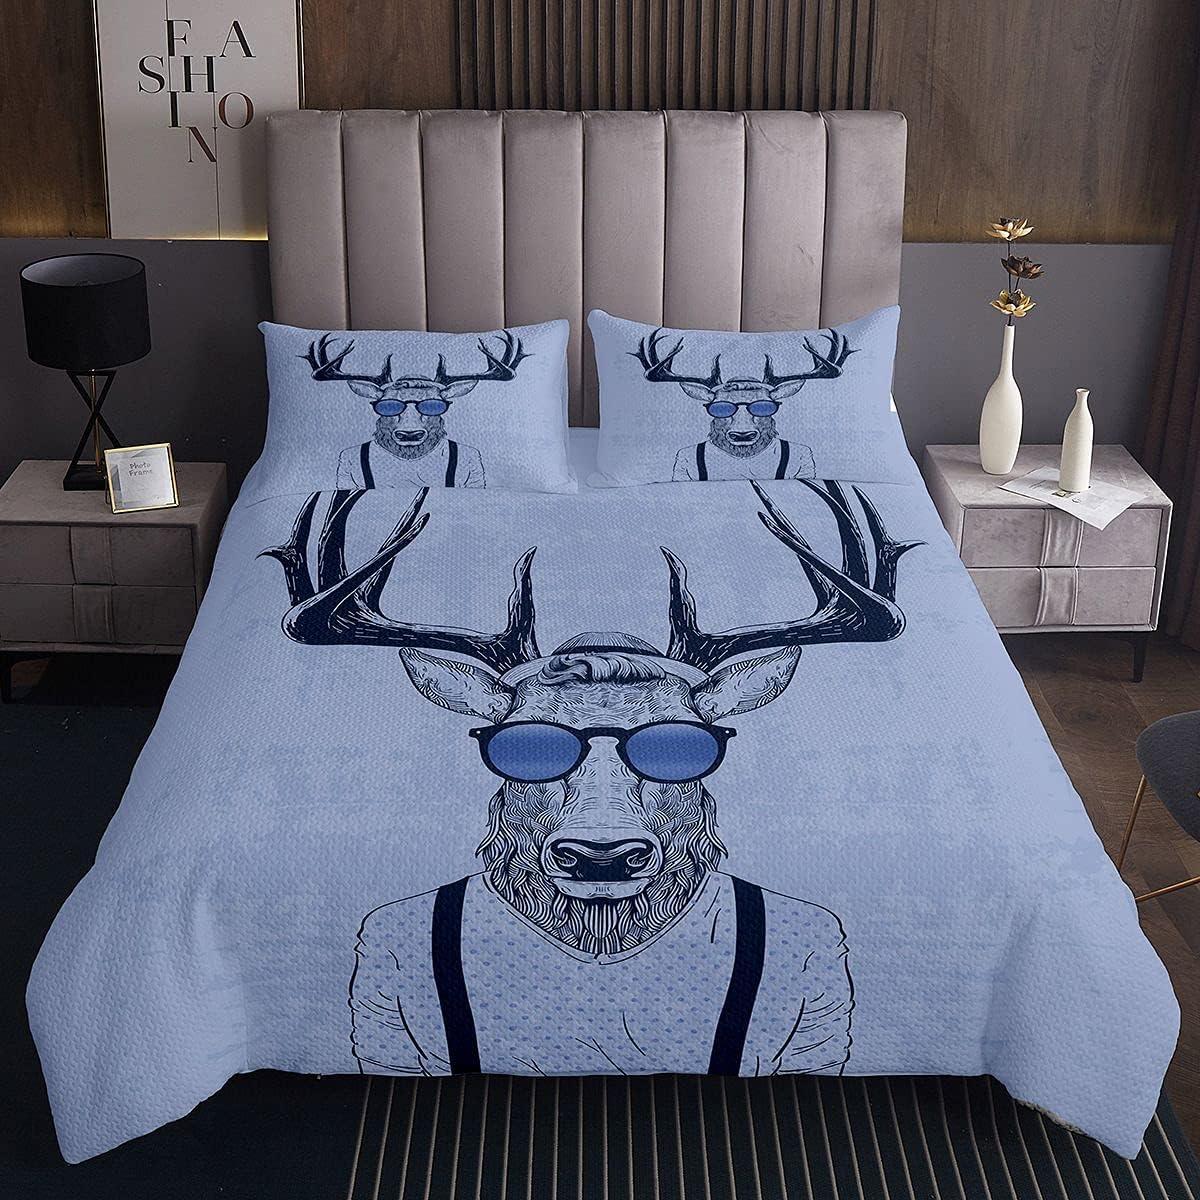 Highland Cow Bull Bedspread Western Qui Portrait Wildlife Animer and price revision Animal Elegant